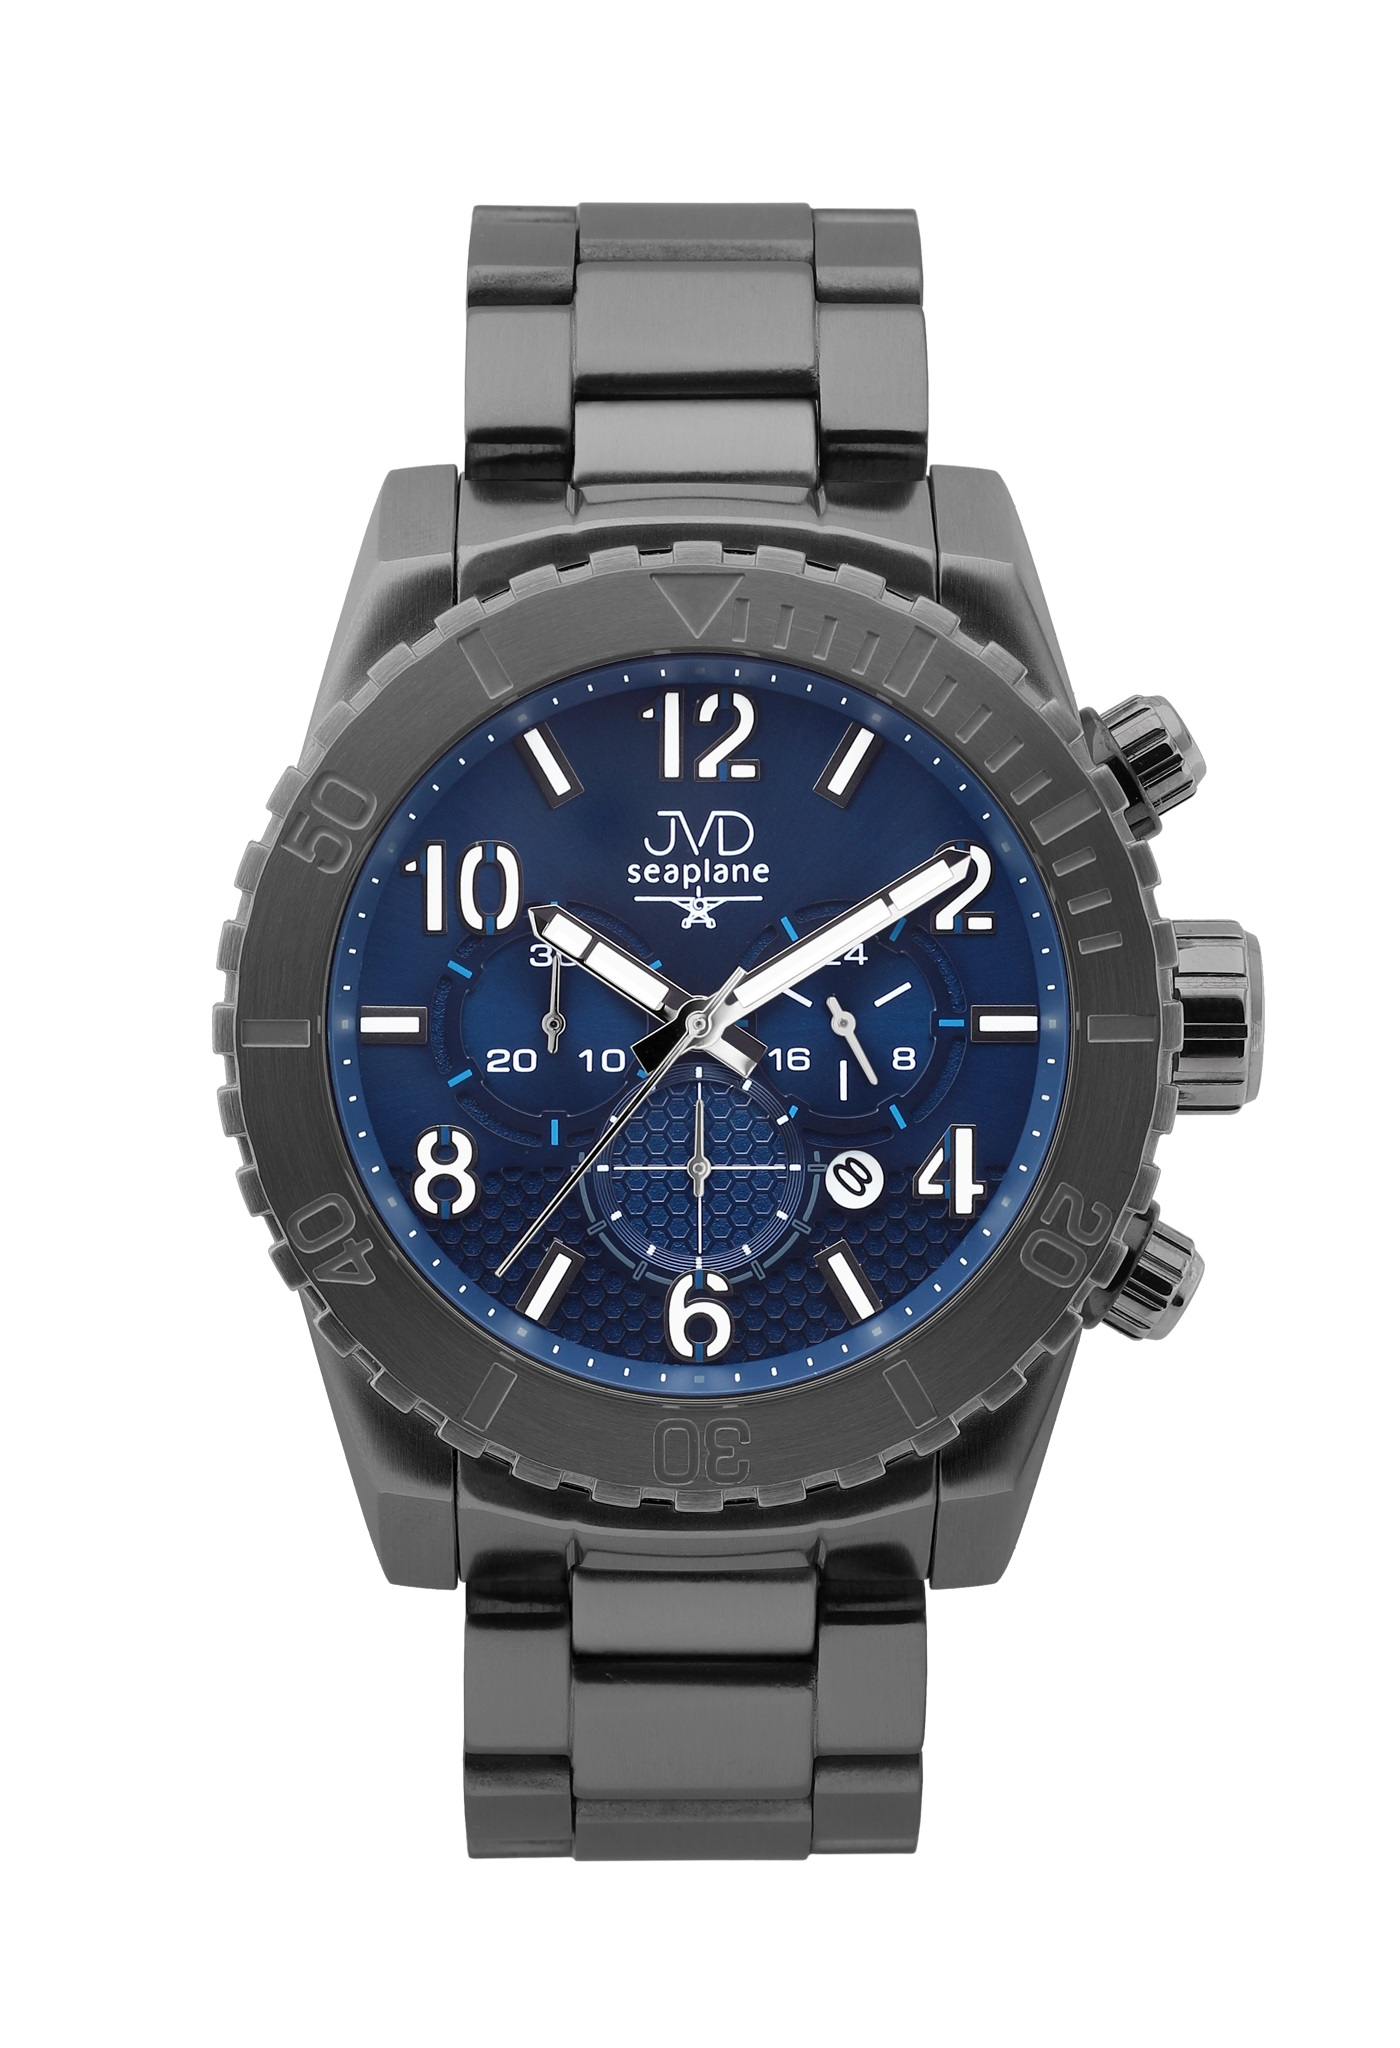 Vodotěsné pánské náramkové hodinky Seaplane METEOR JC703.1 (POŠTOVNÉ ZDARMA!!!)